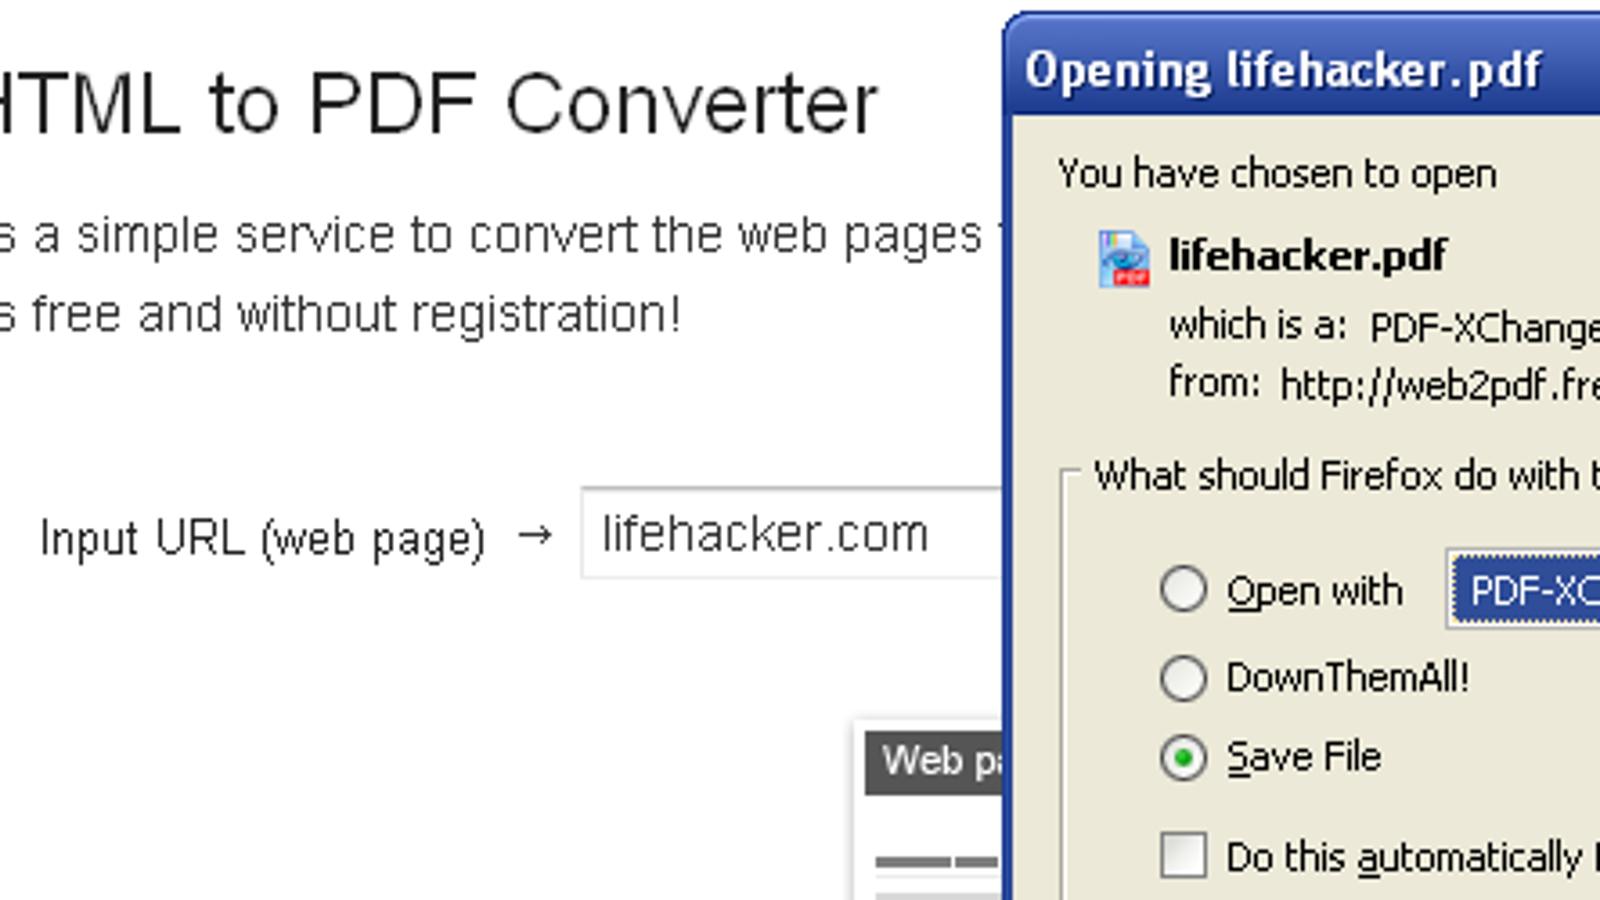 HTML to PDF Converter Turns Web Sites into PDF Files